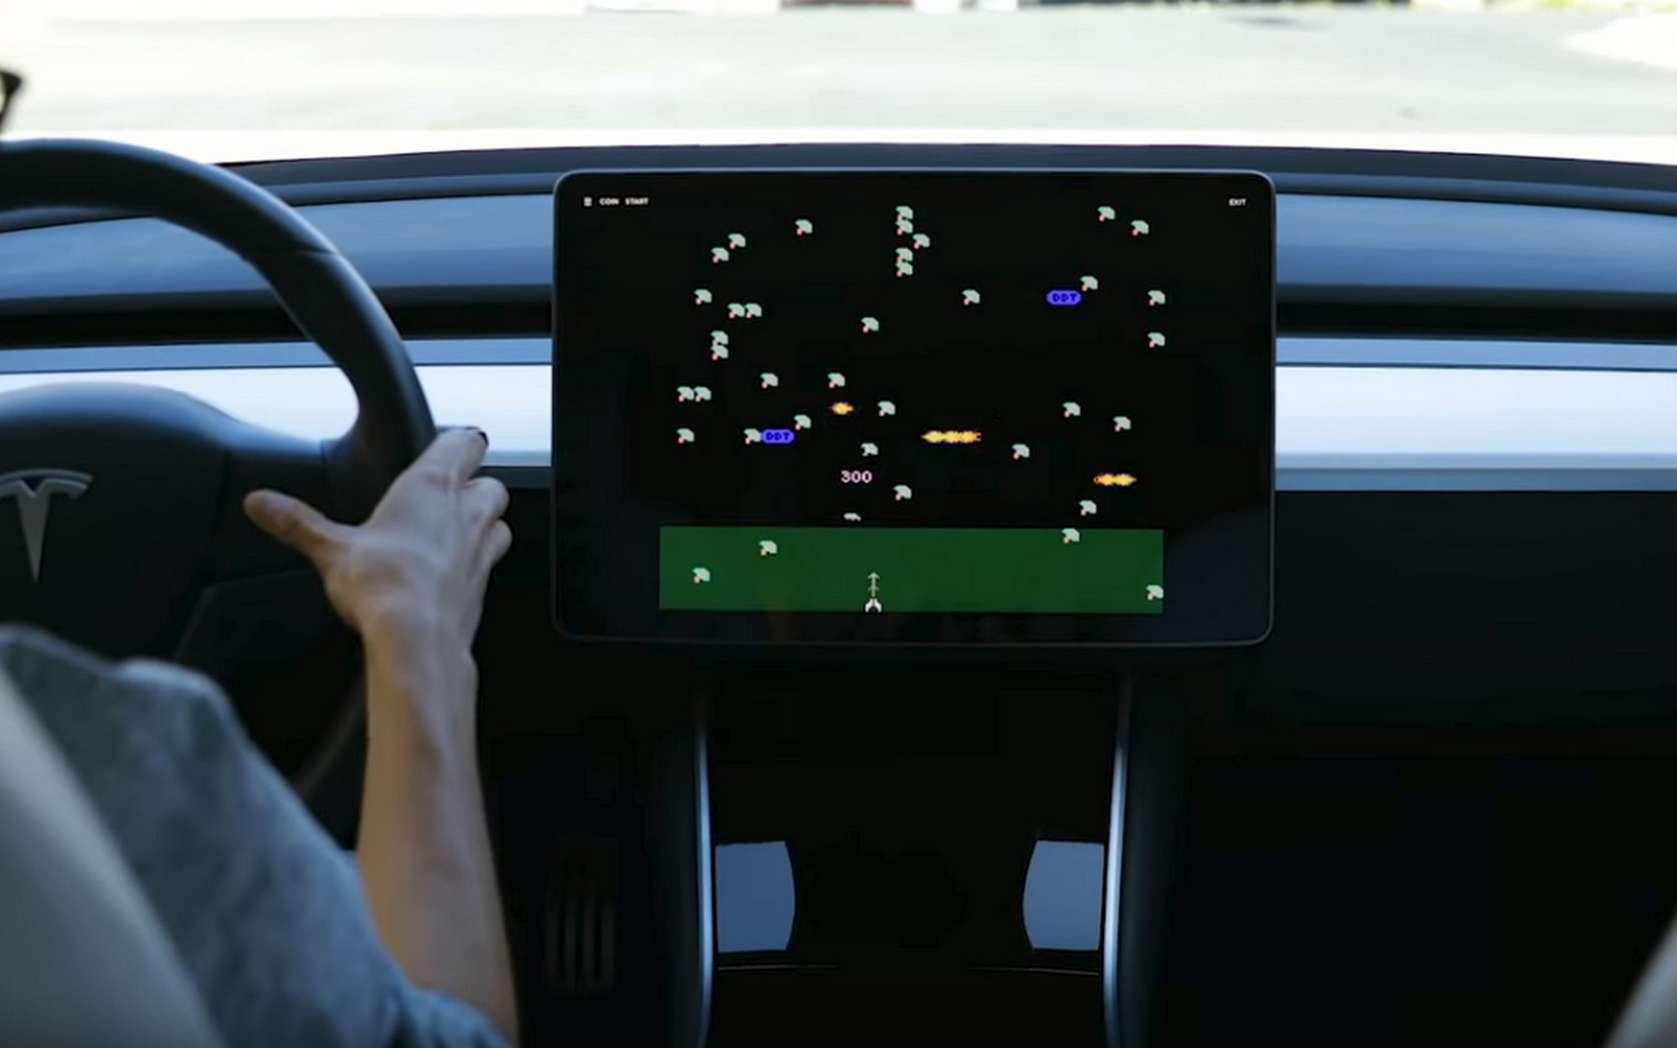 La Tesla peut se transformer en borne d'arcade Atari rétro. © Tesla